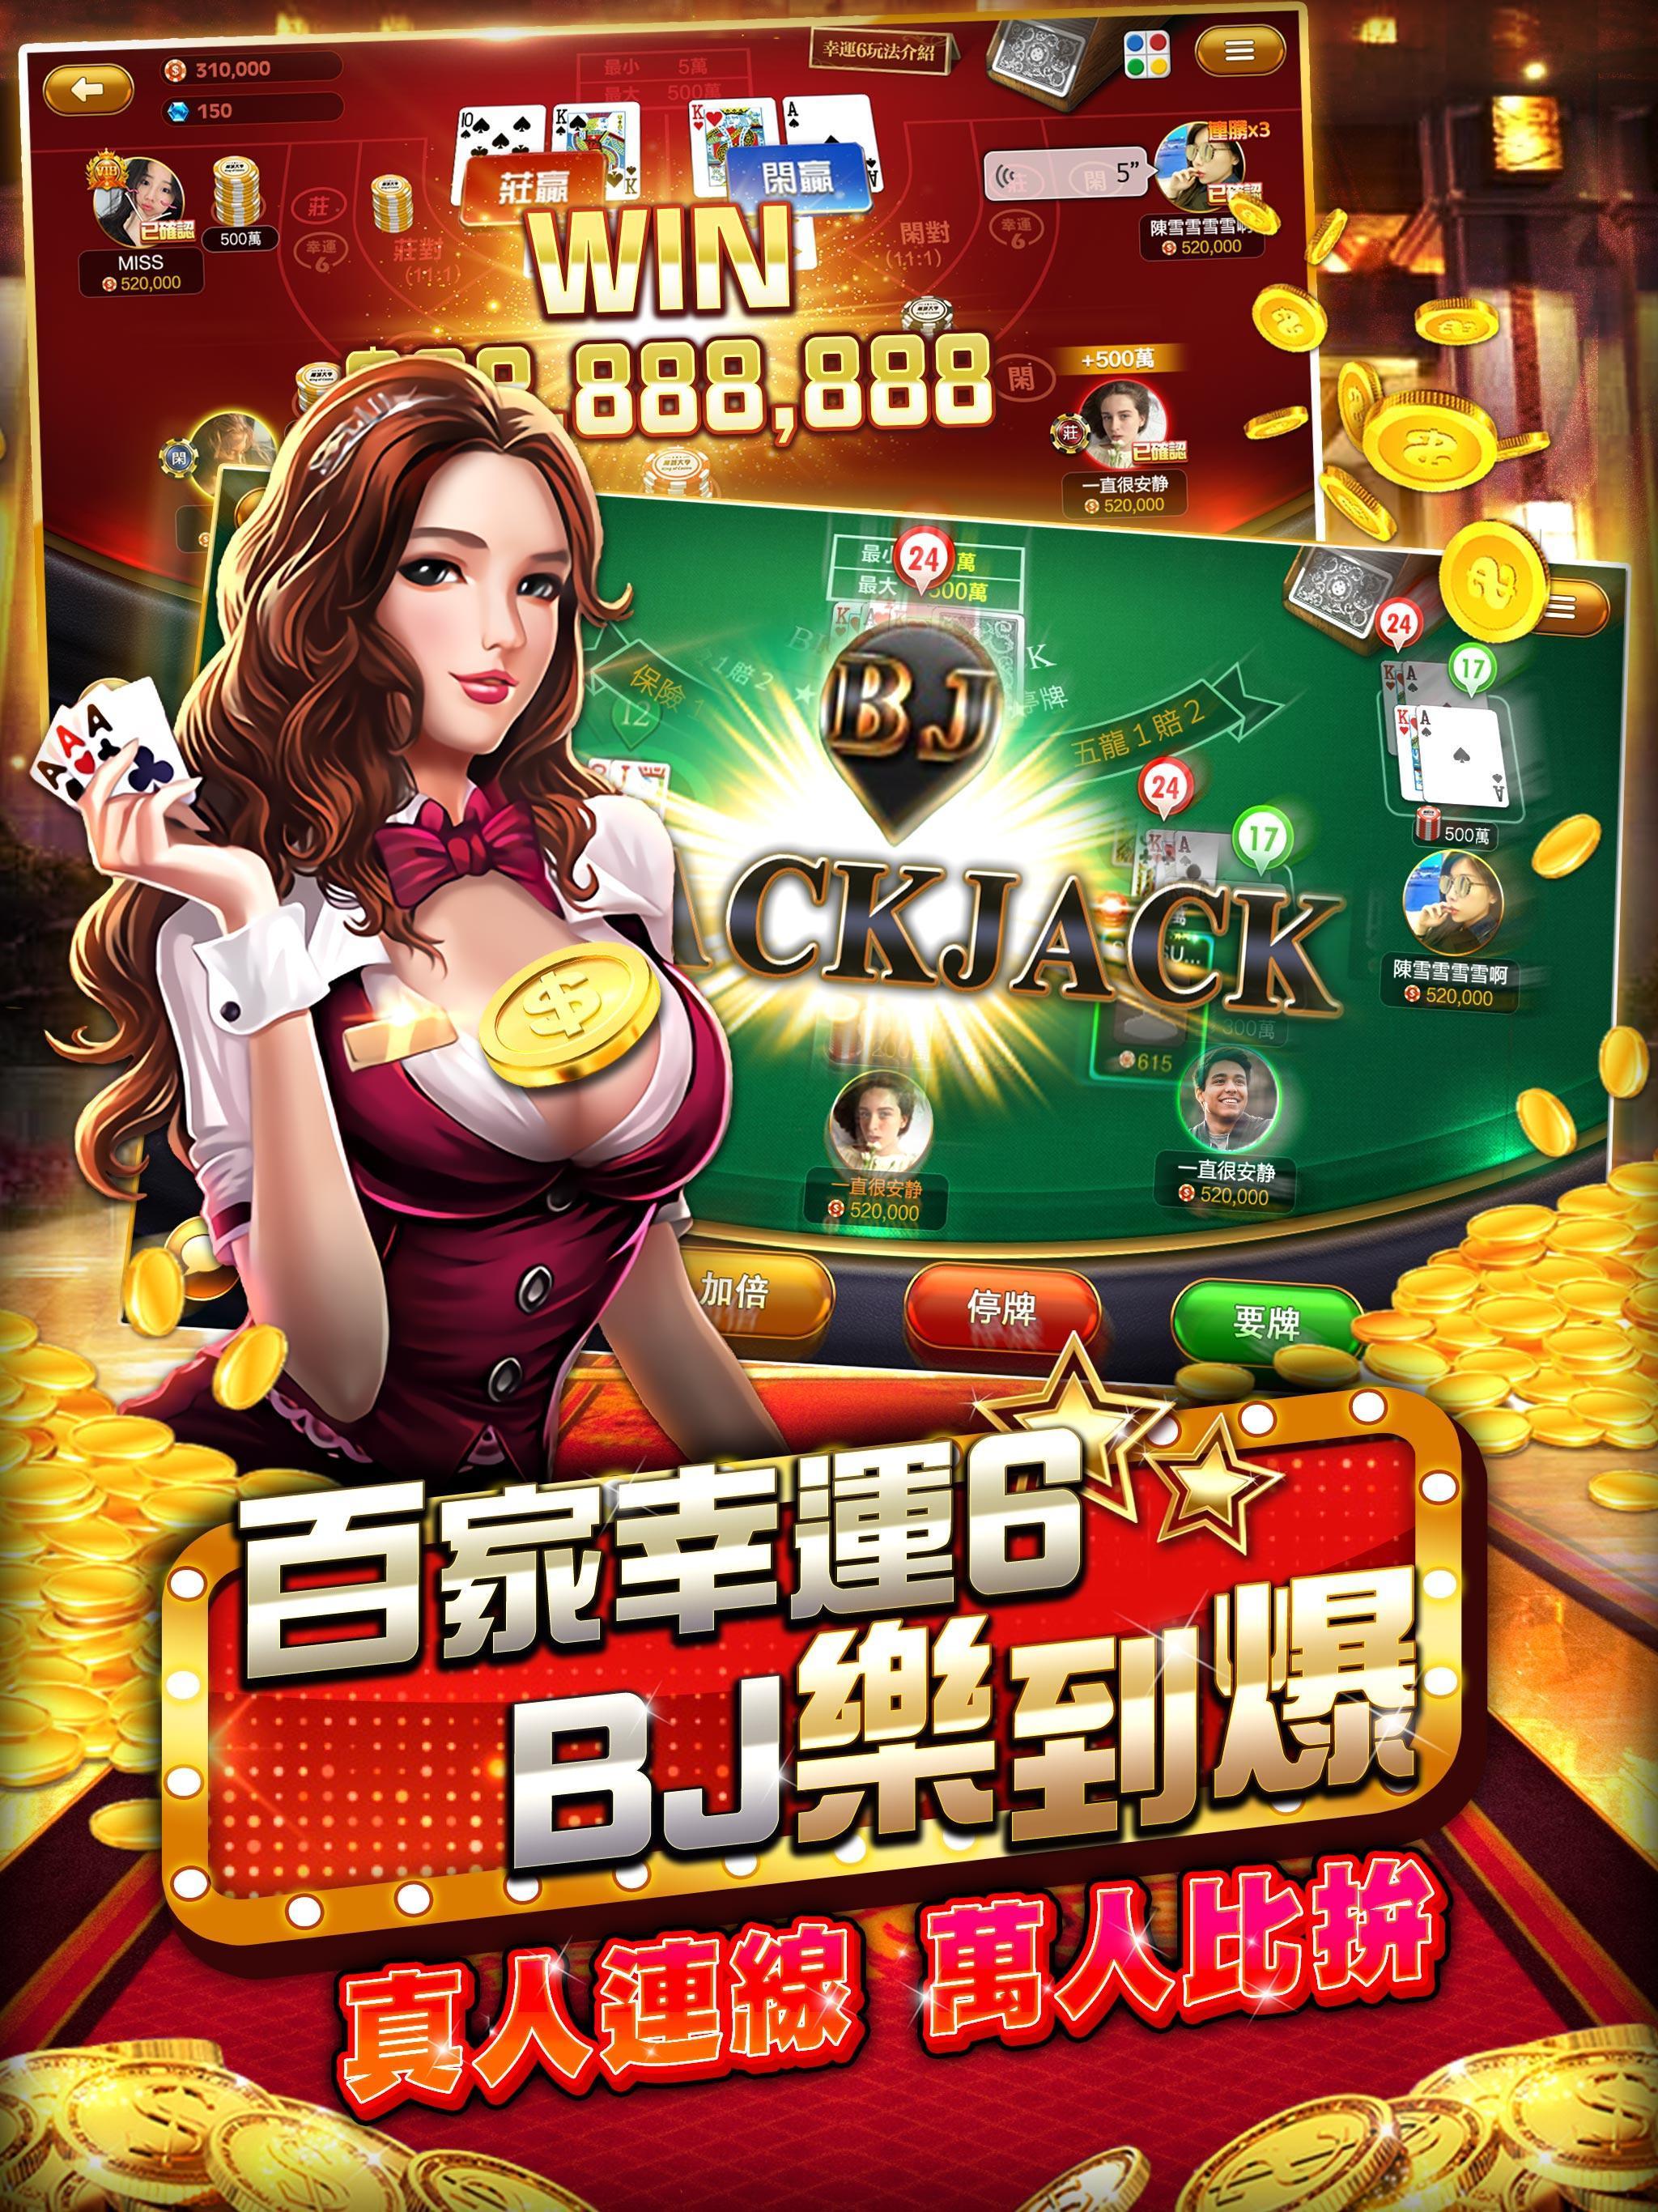 金錢豹娛樂城 2.0.0 Screenshot 8